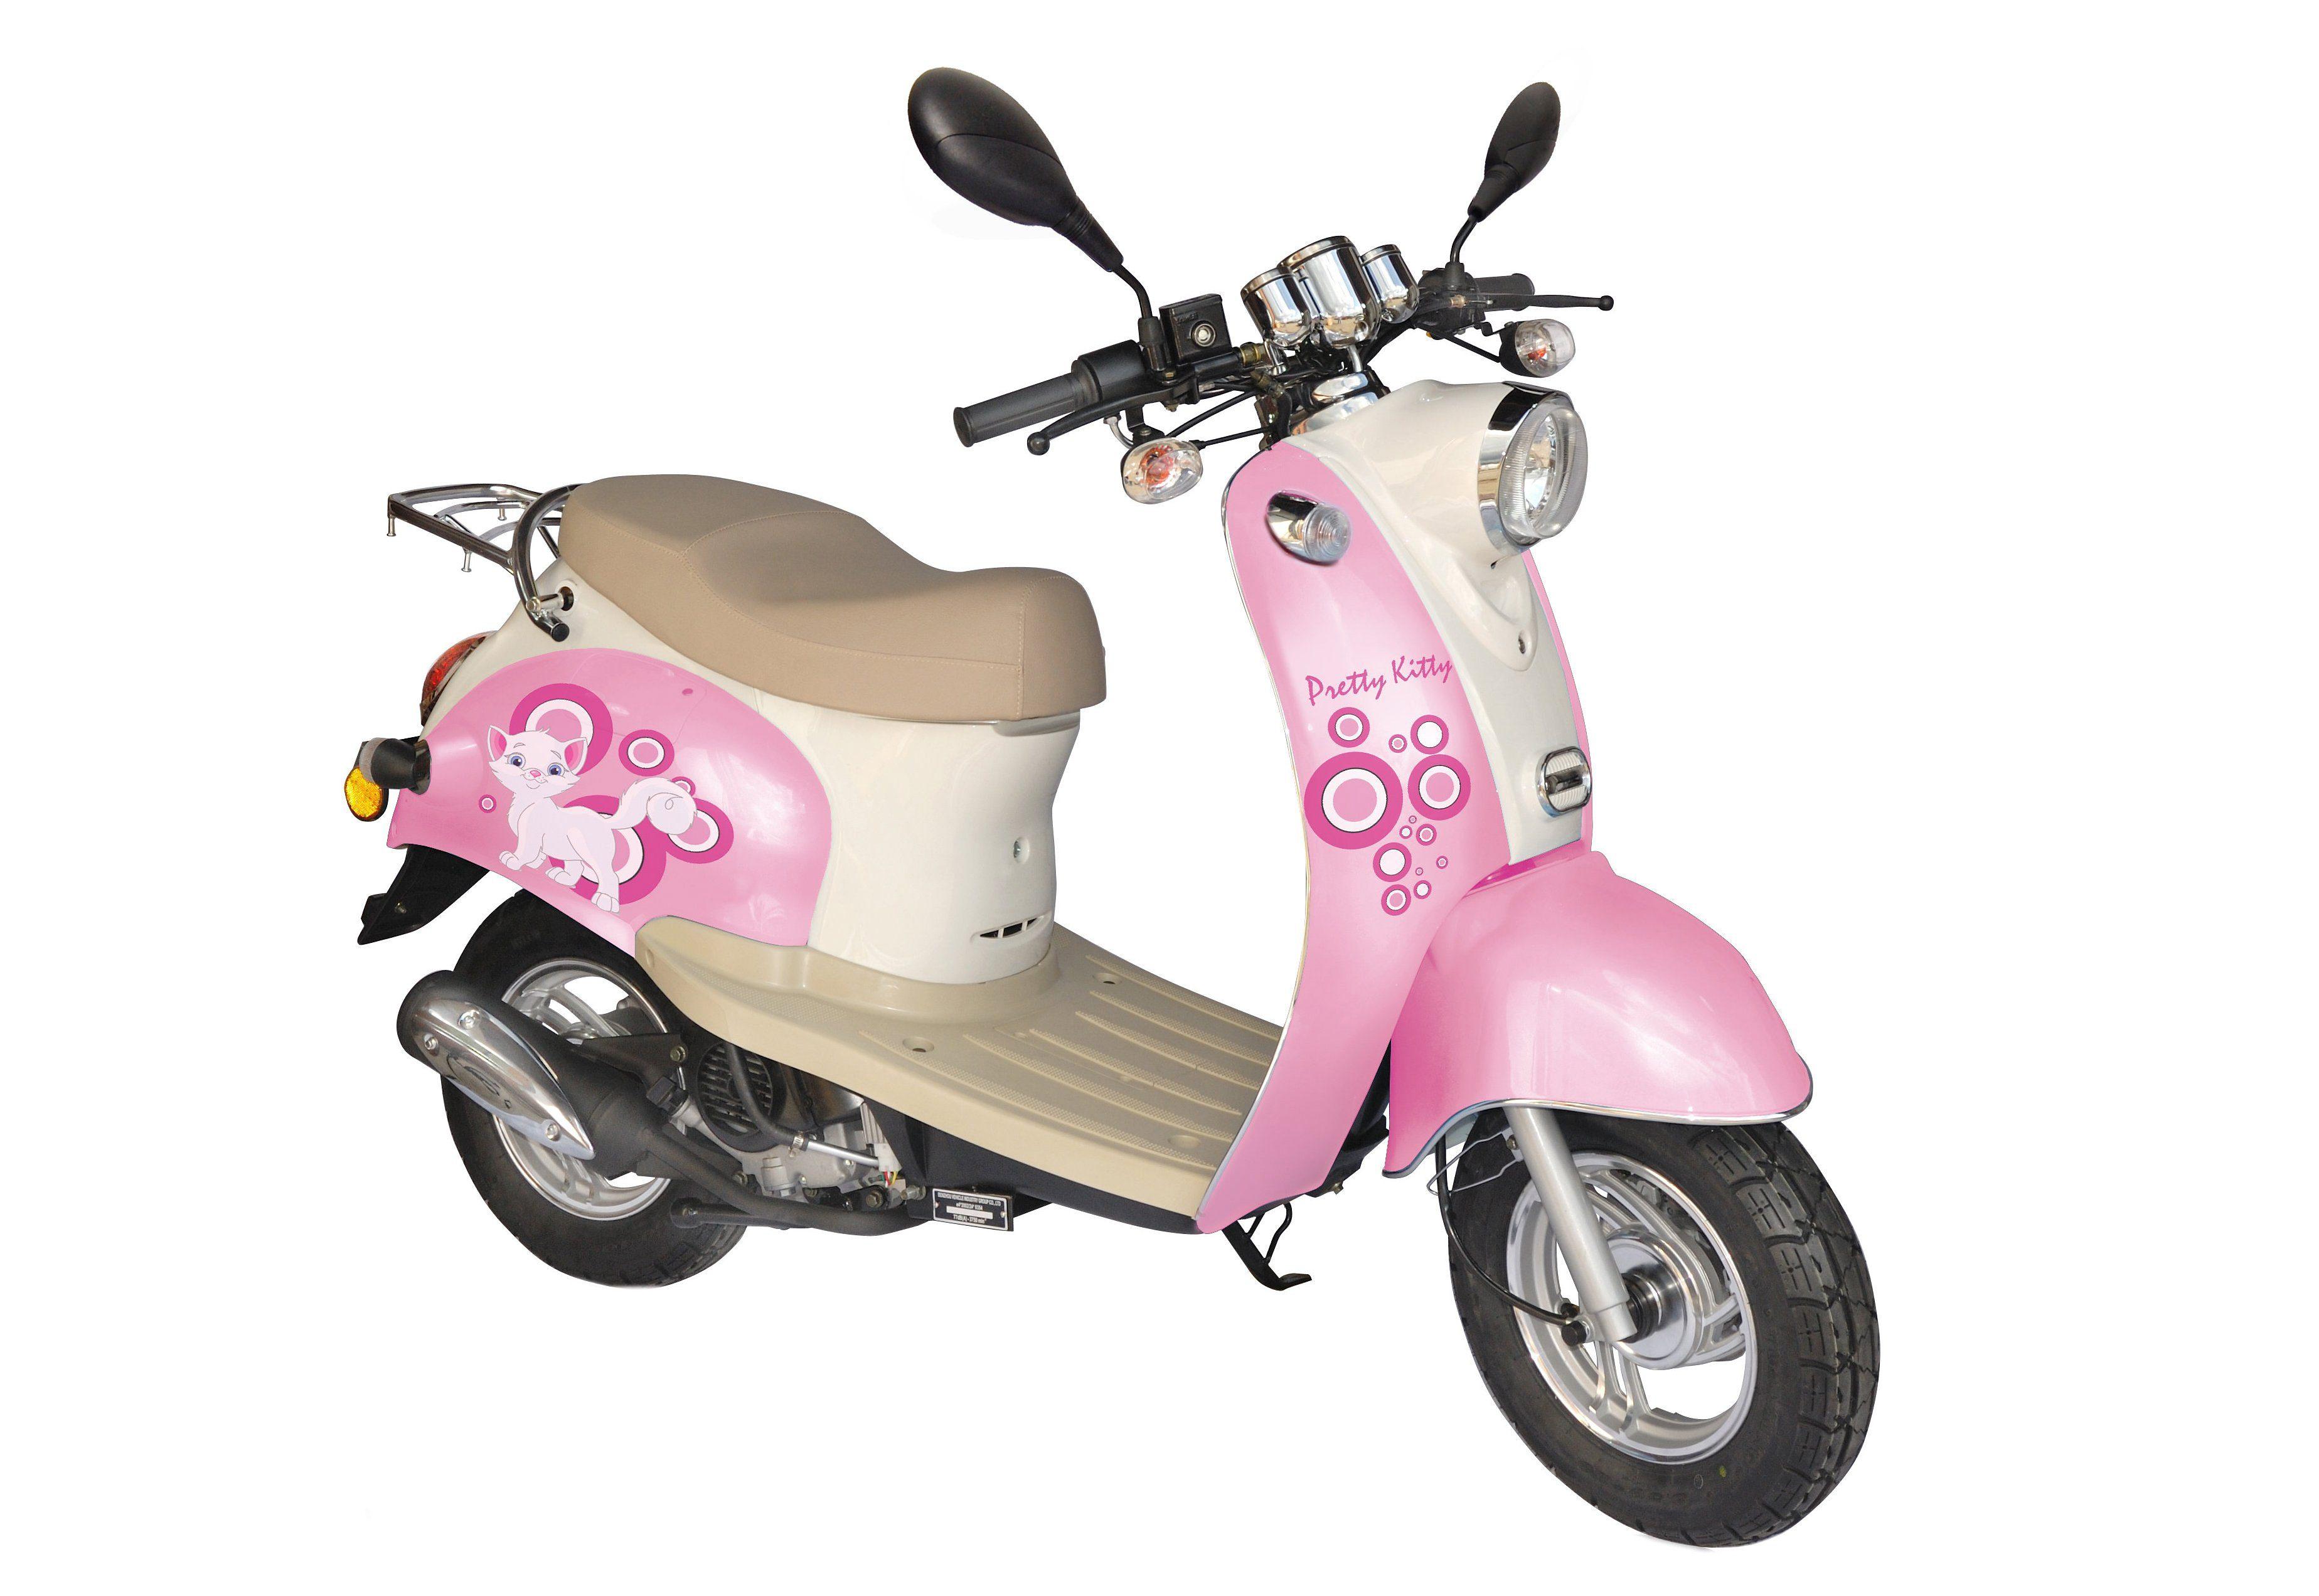 Retro-Motorroller, Nova Motors, »Venezia II«, Pretty Kitty, 50 ccm 45 km/h, rosa-weiß